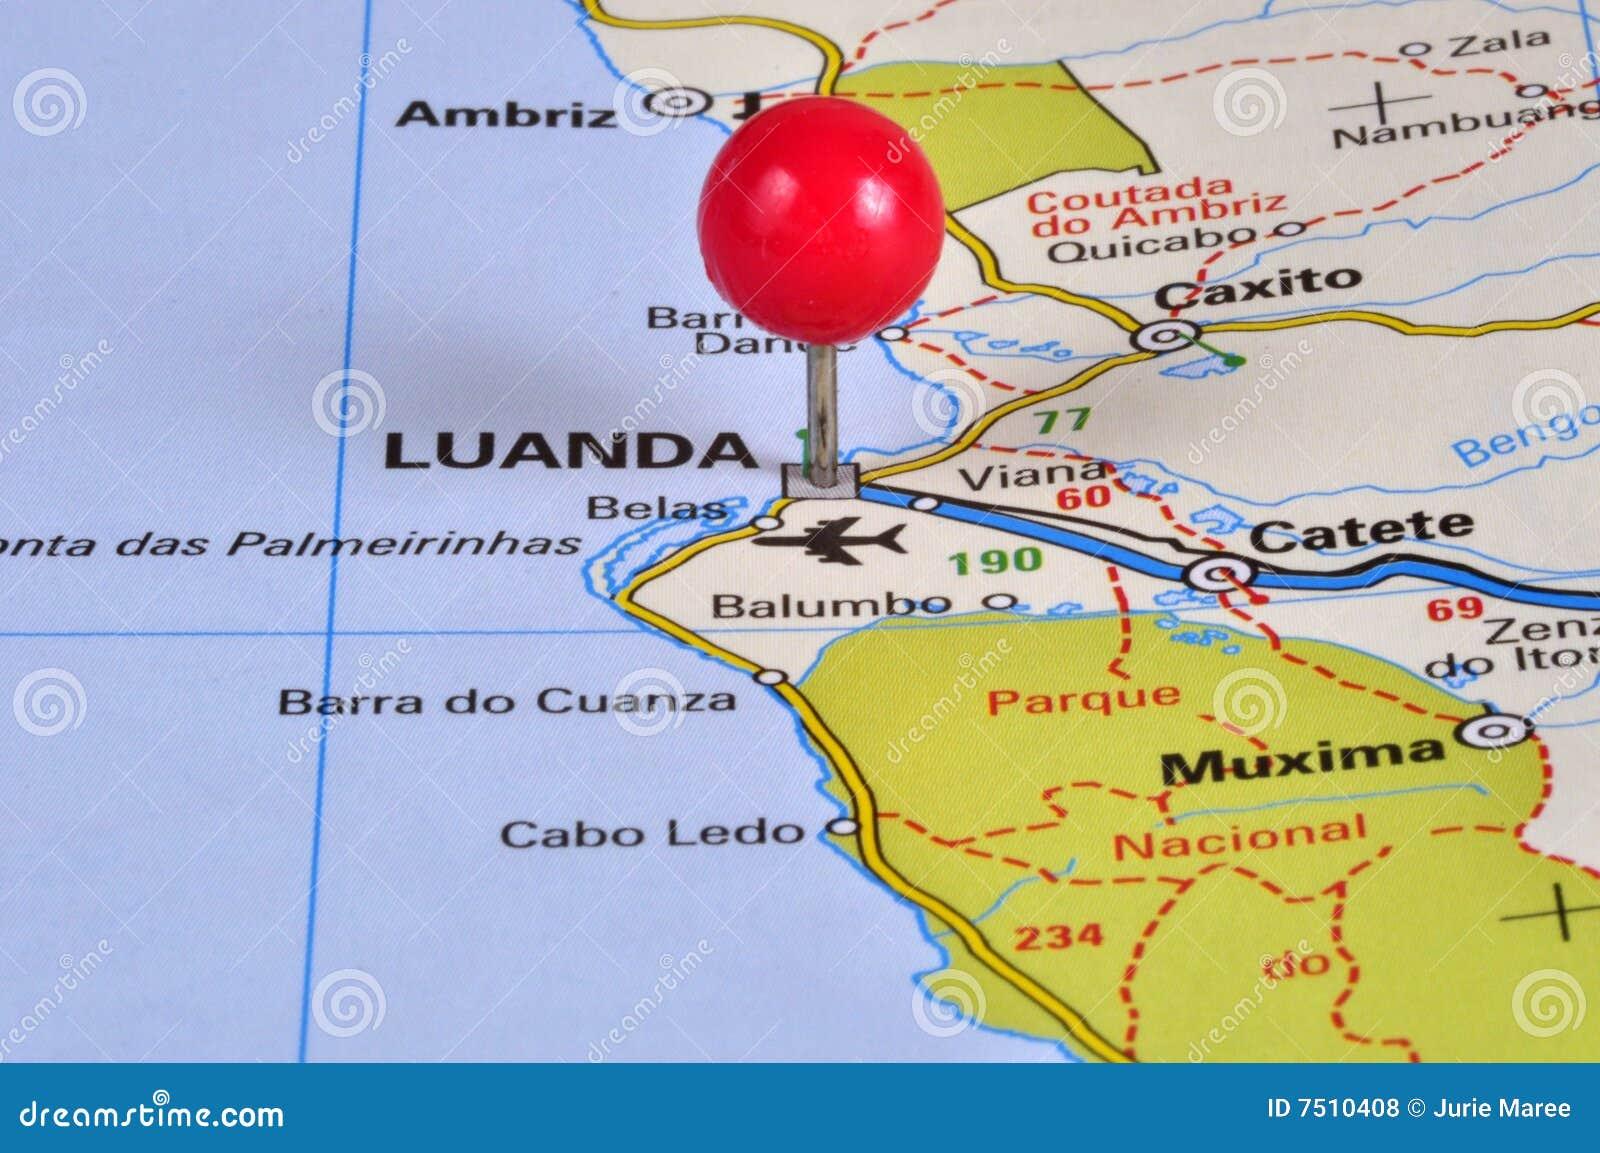 luanda angola africa map